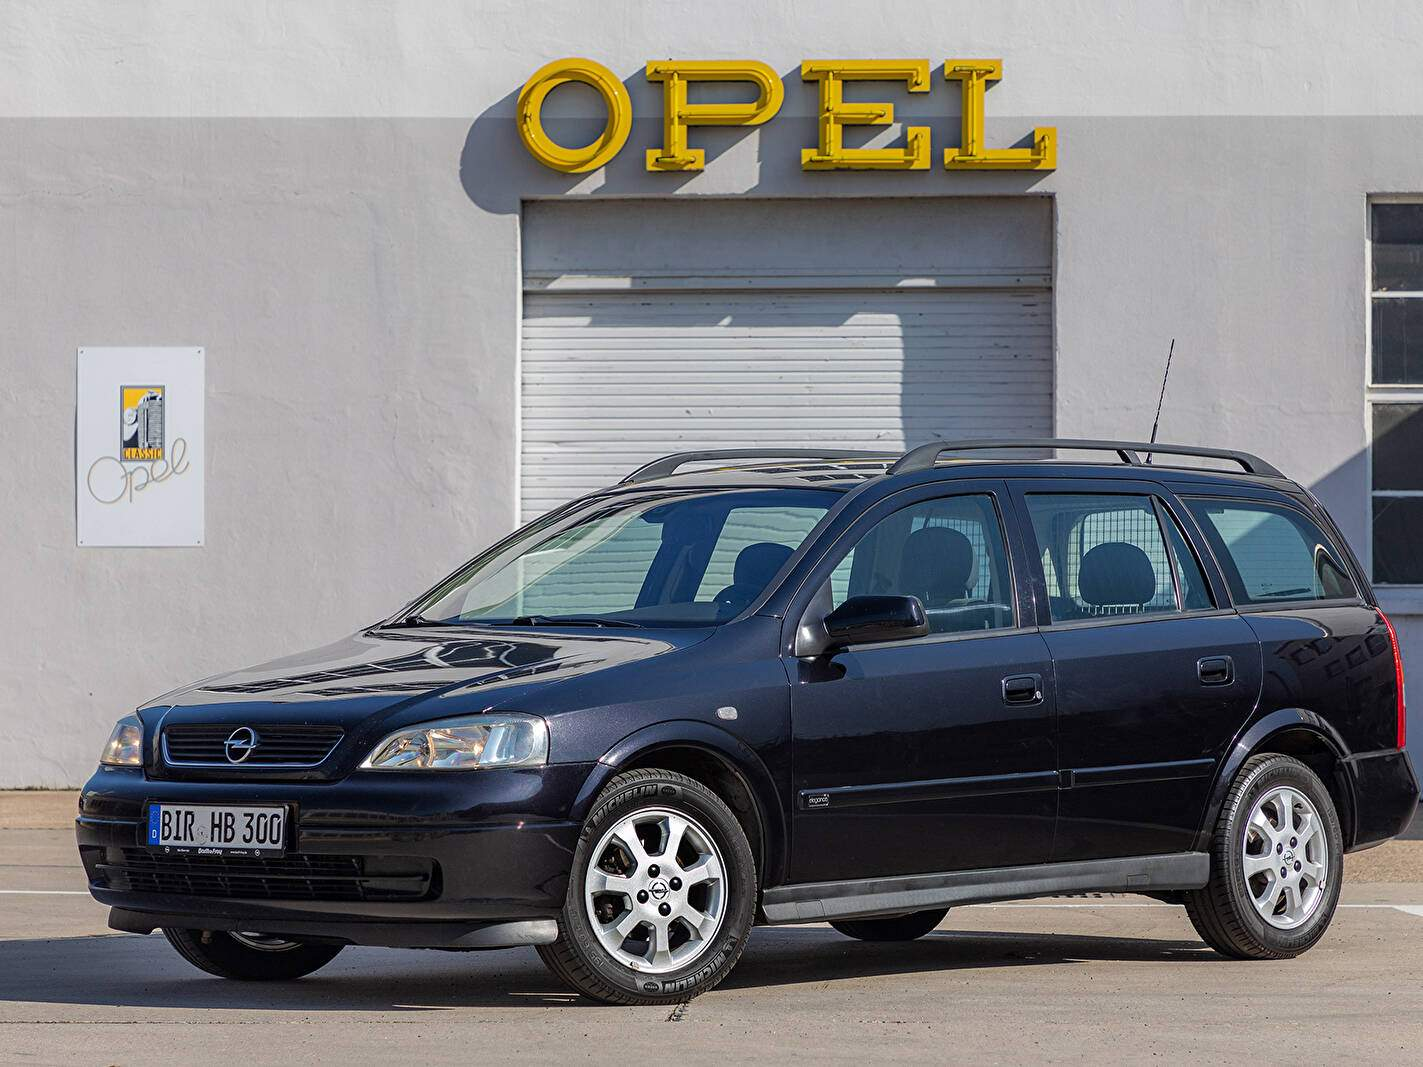 Opel Astra II Caravan 1.7 CDTi 80 (2003-2005),  ajouté par fox58